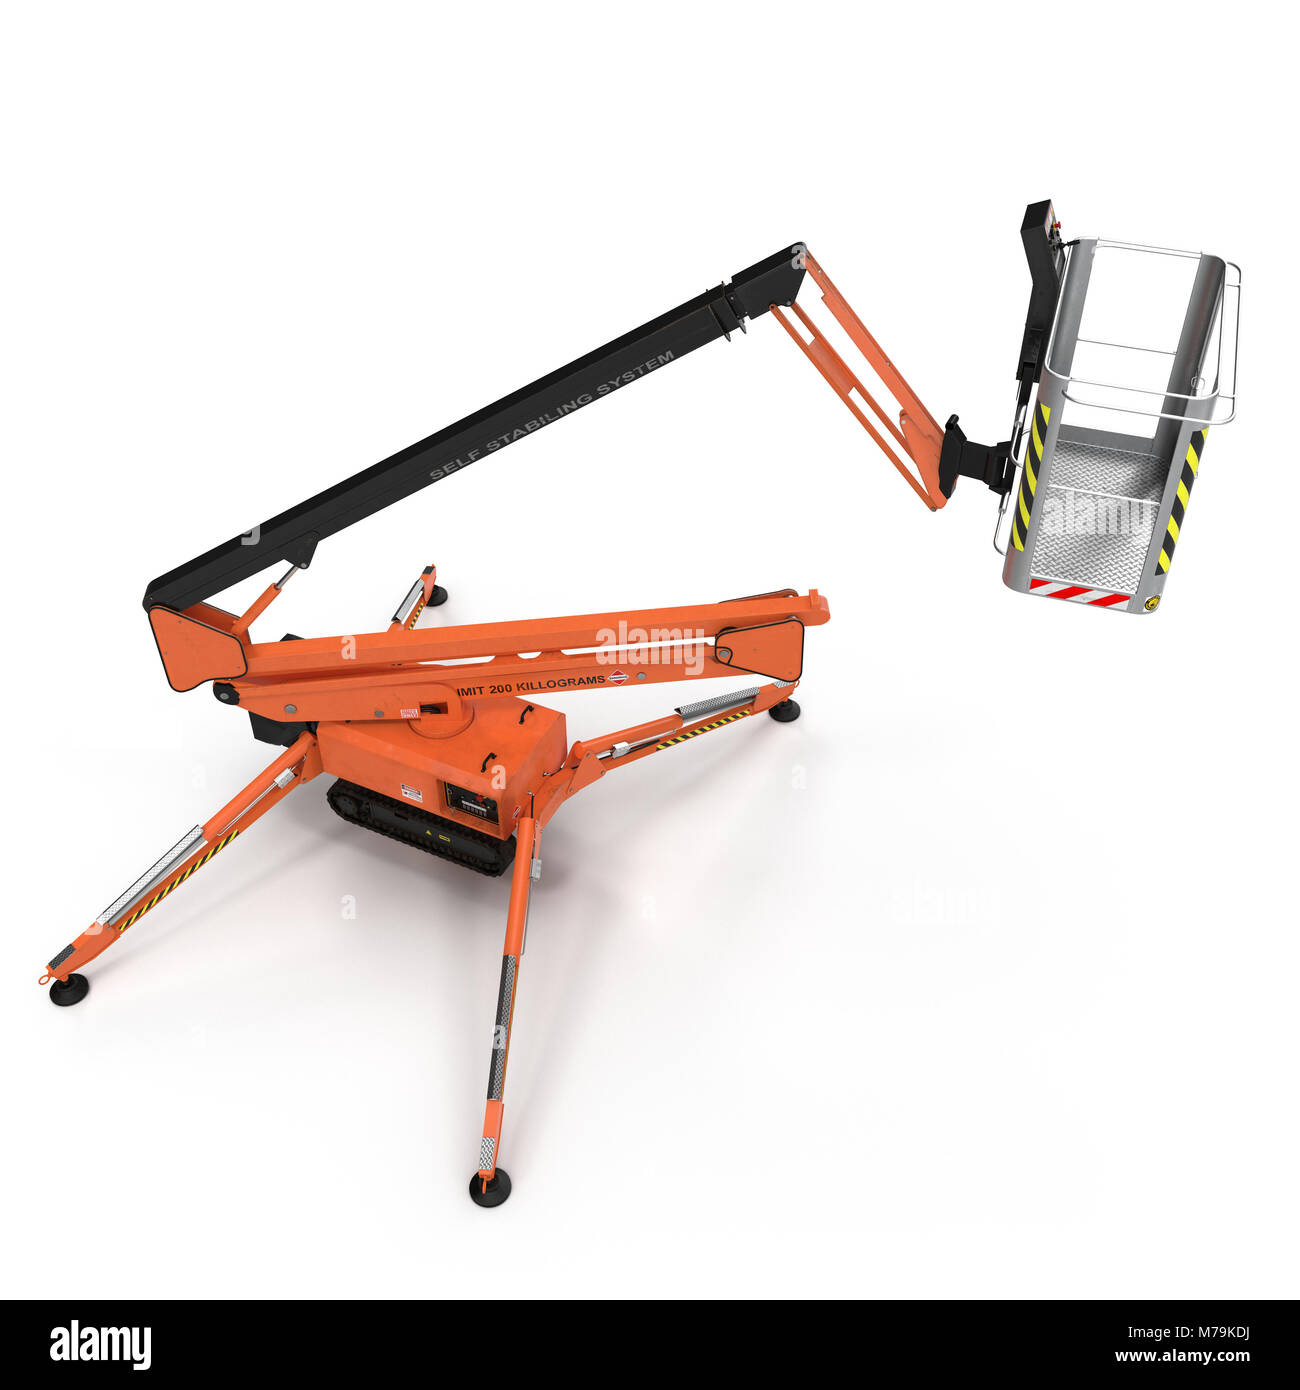 large orange extended scissor lift platform on white